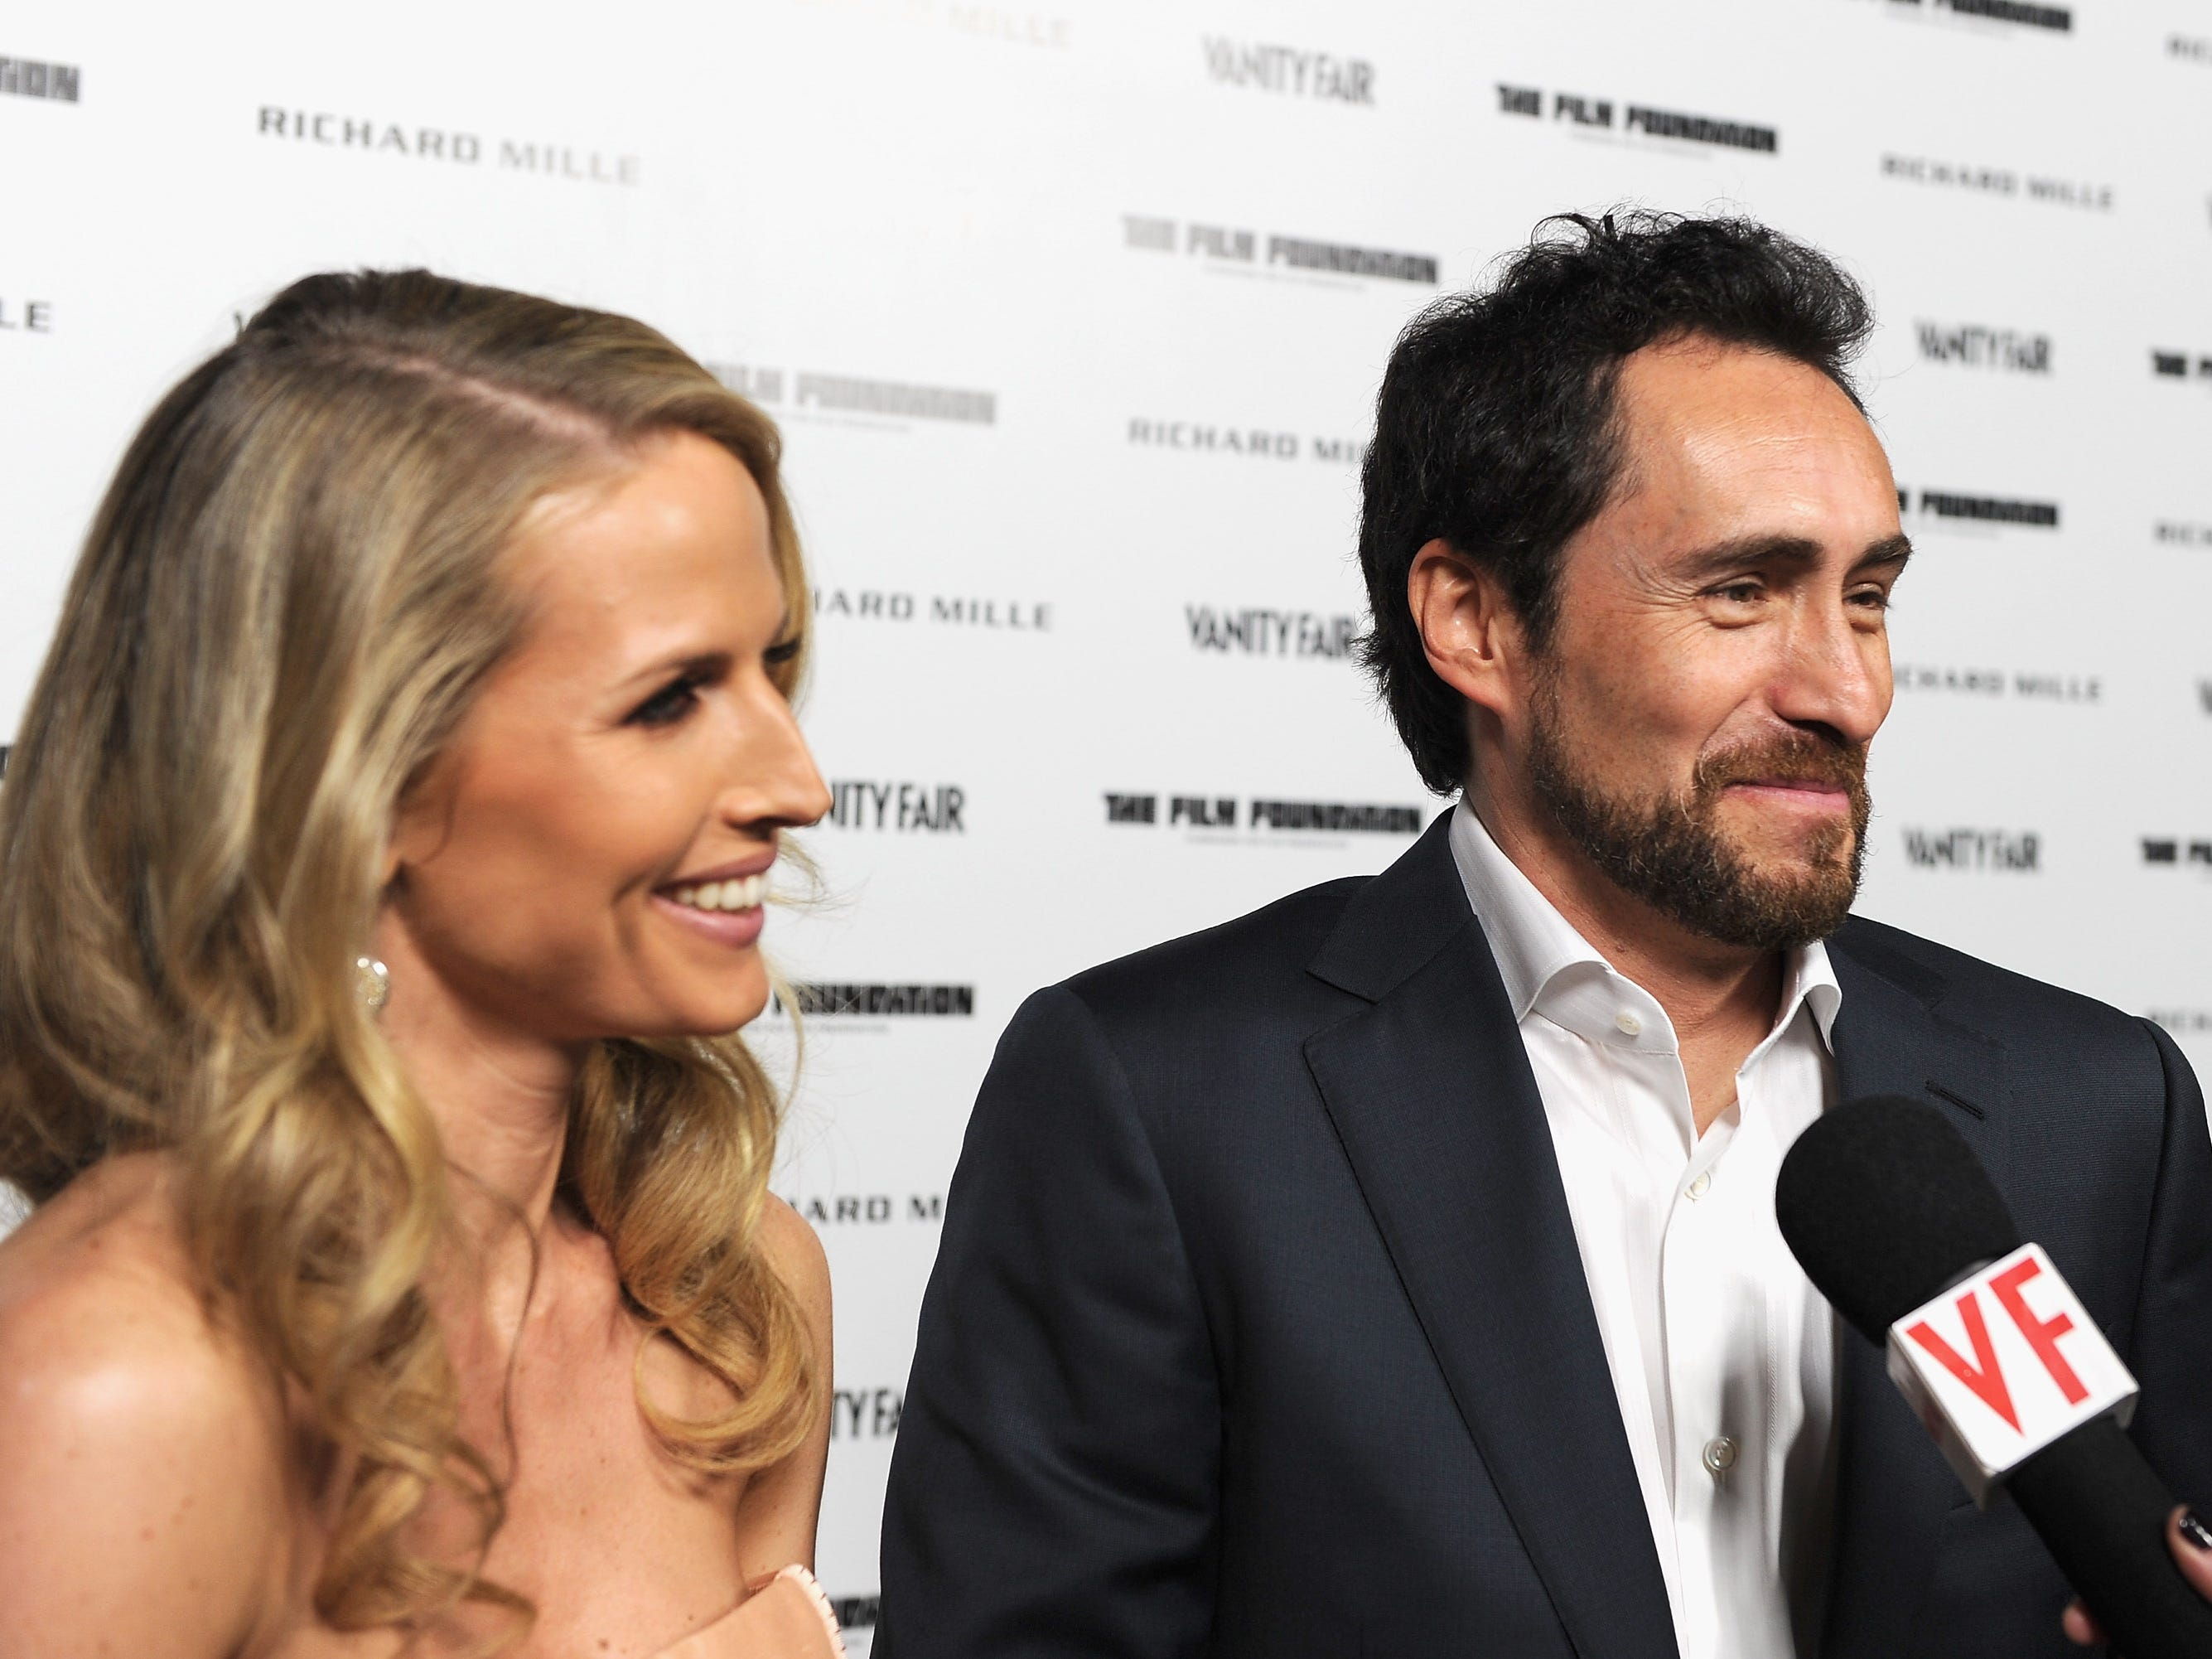 Demian Bichir and Stefanie Sherk attend a Martin Scorsese celebration at Hotel Bel-Air on Feb. 24, 2012, in Los Angeles, California.